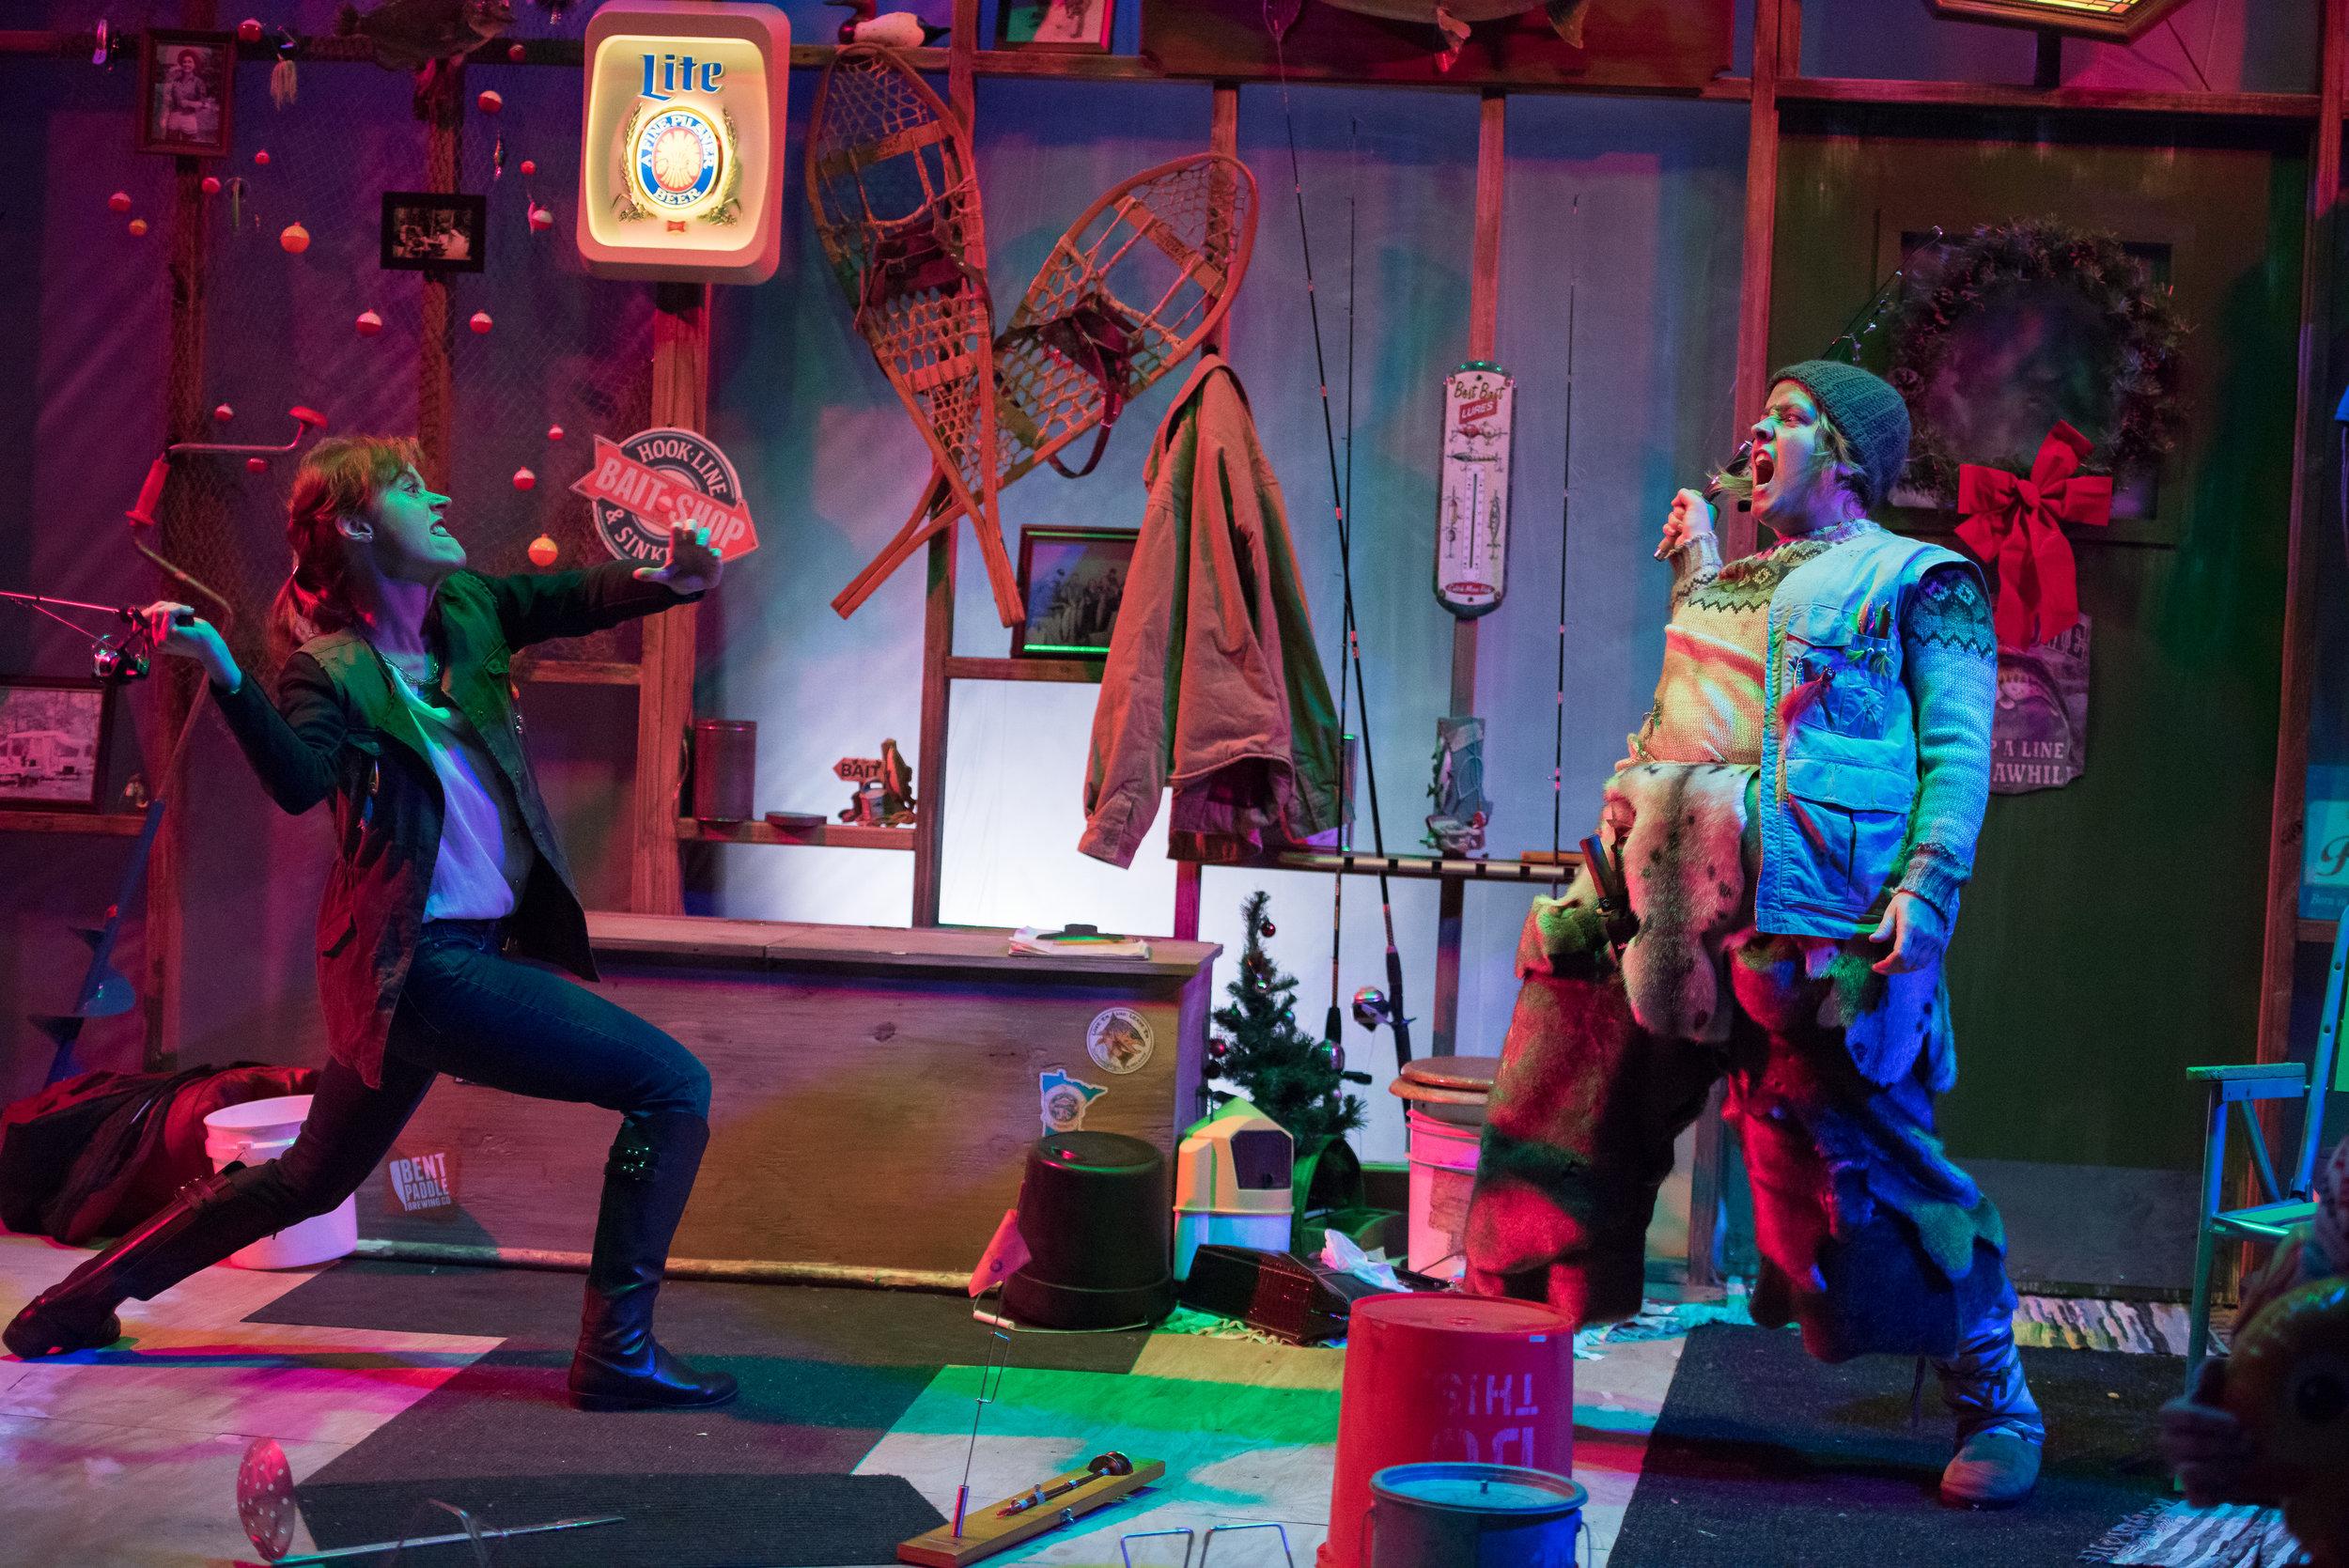 135-Yellow-Tree-Theatre-Gone-Fishin-Stage-photography-Minneapolis-Photographer-November 08, 2016-www.jcoxphotography.com.jpg